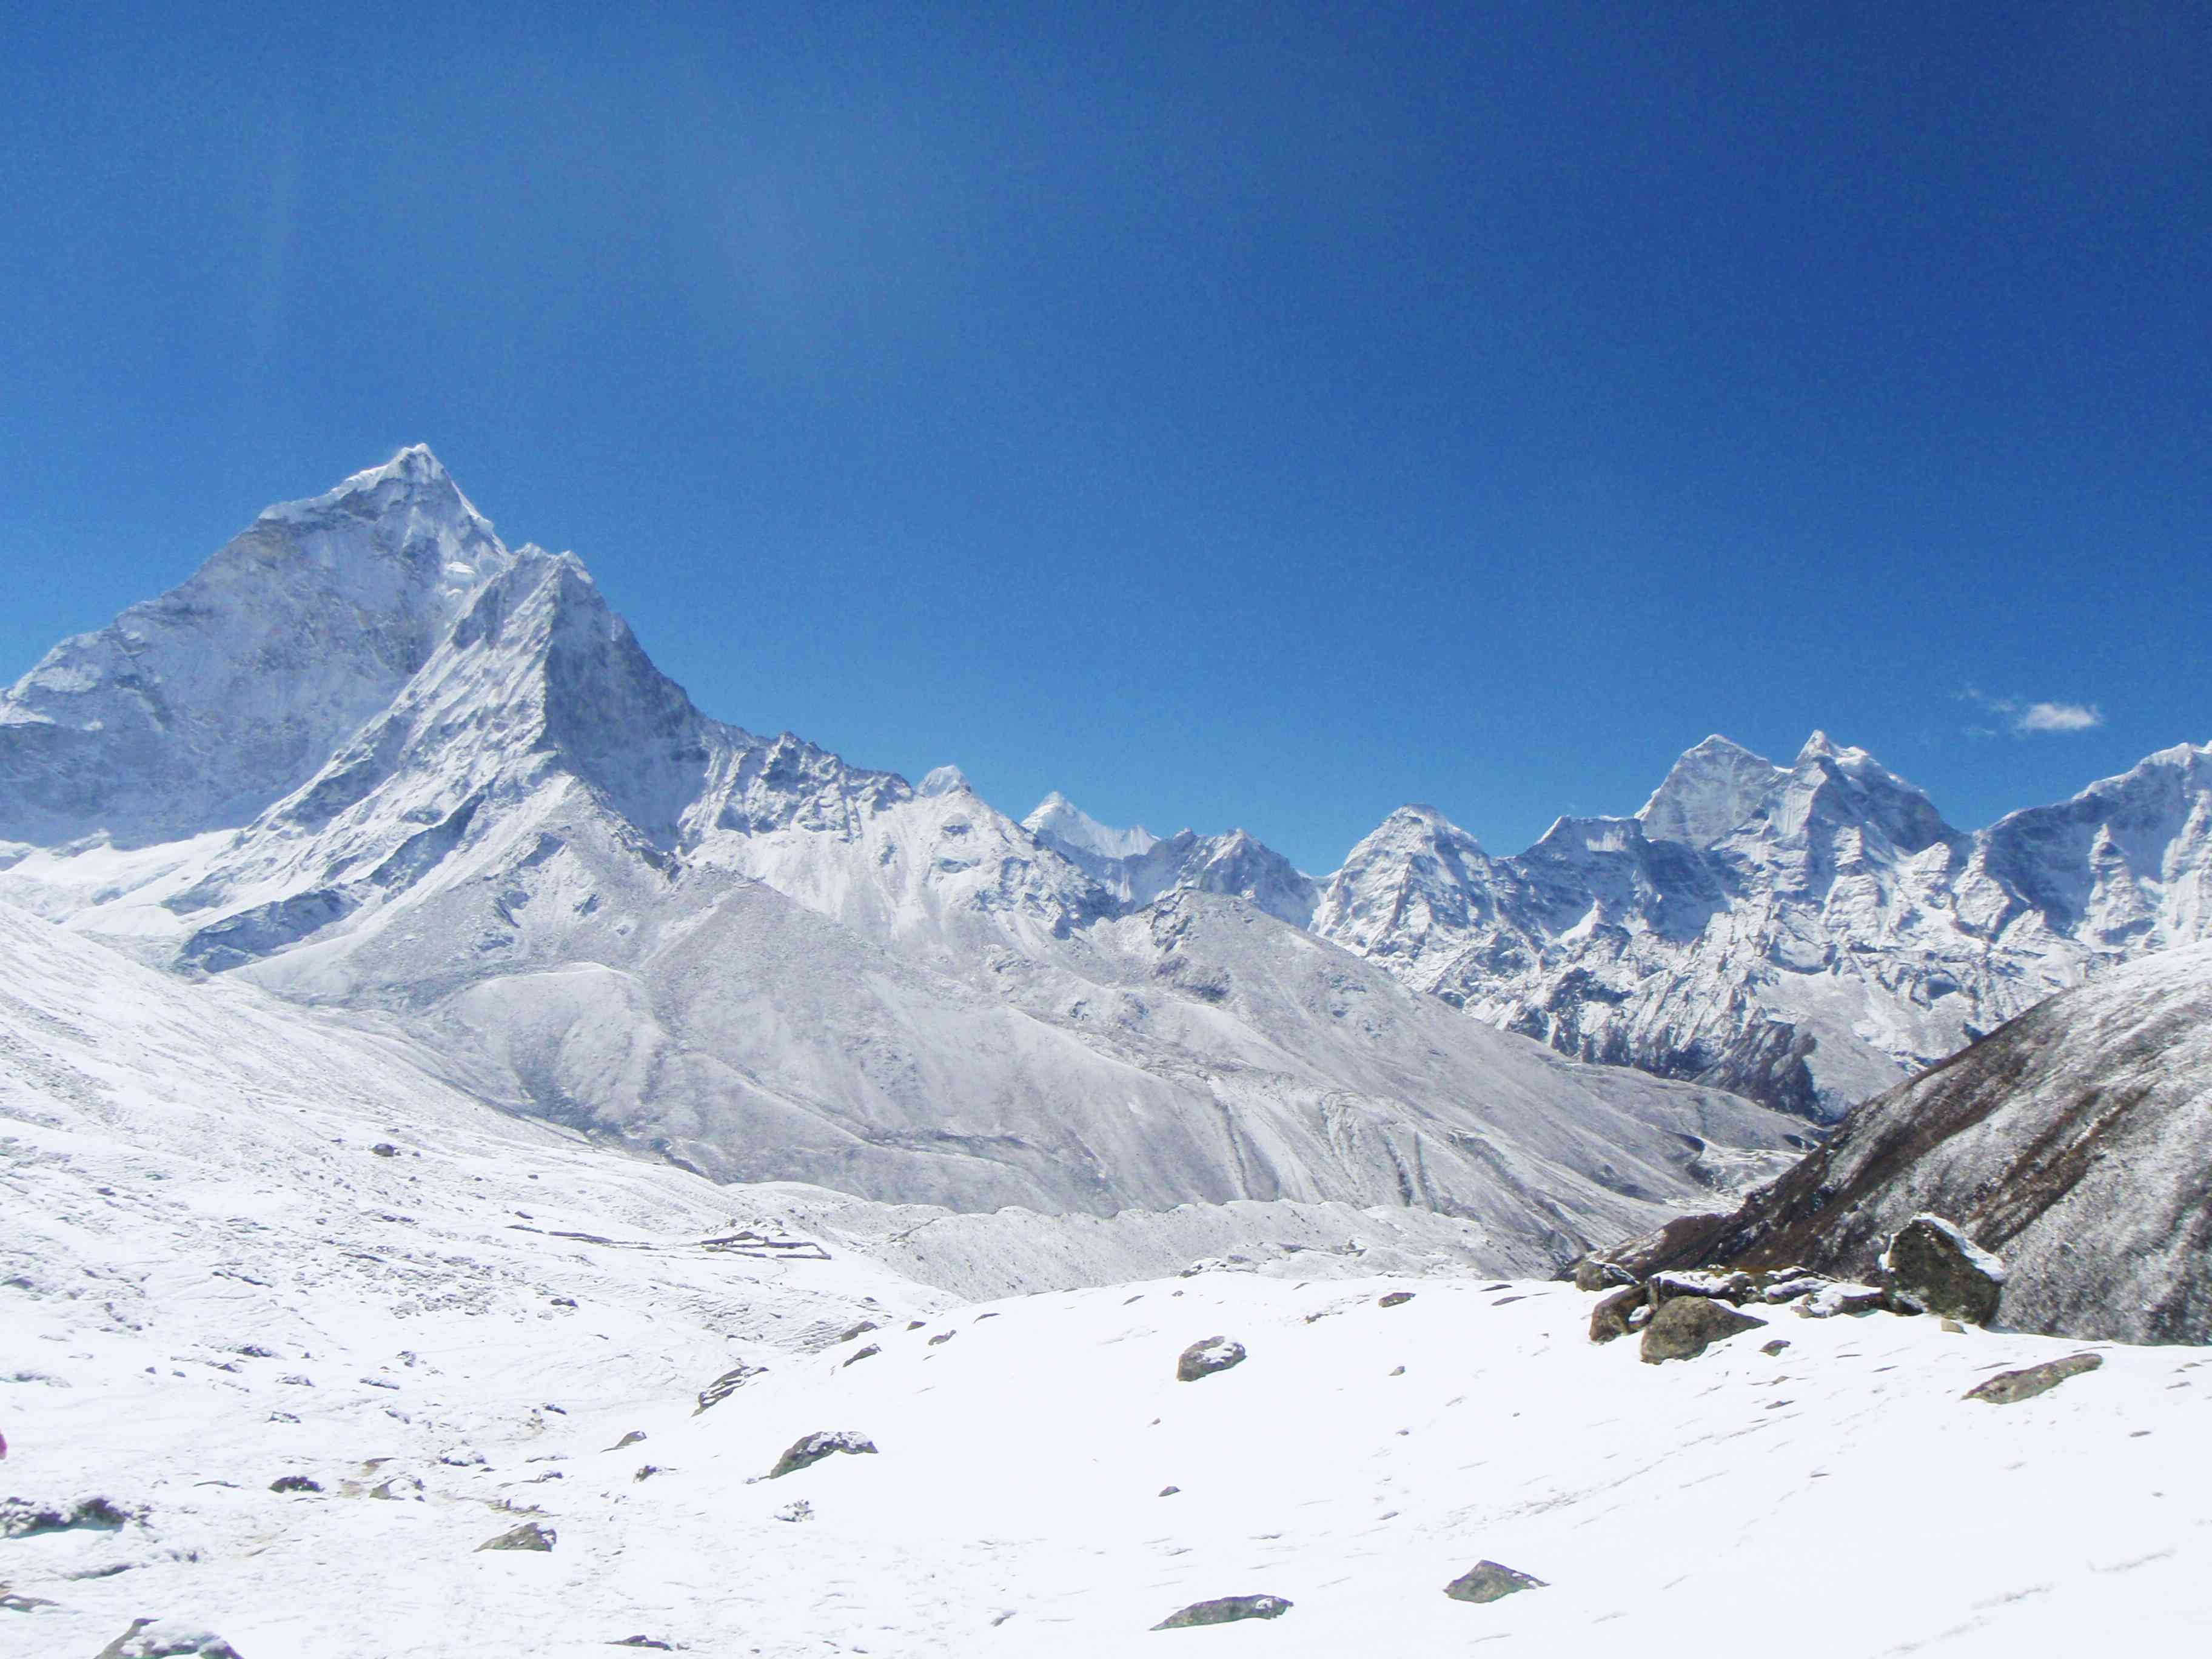 Snowy mountains on the Himalayan Trek